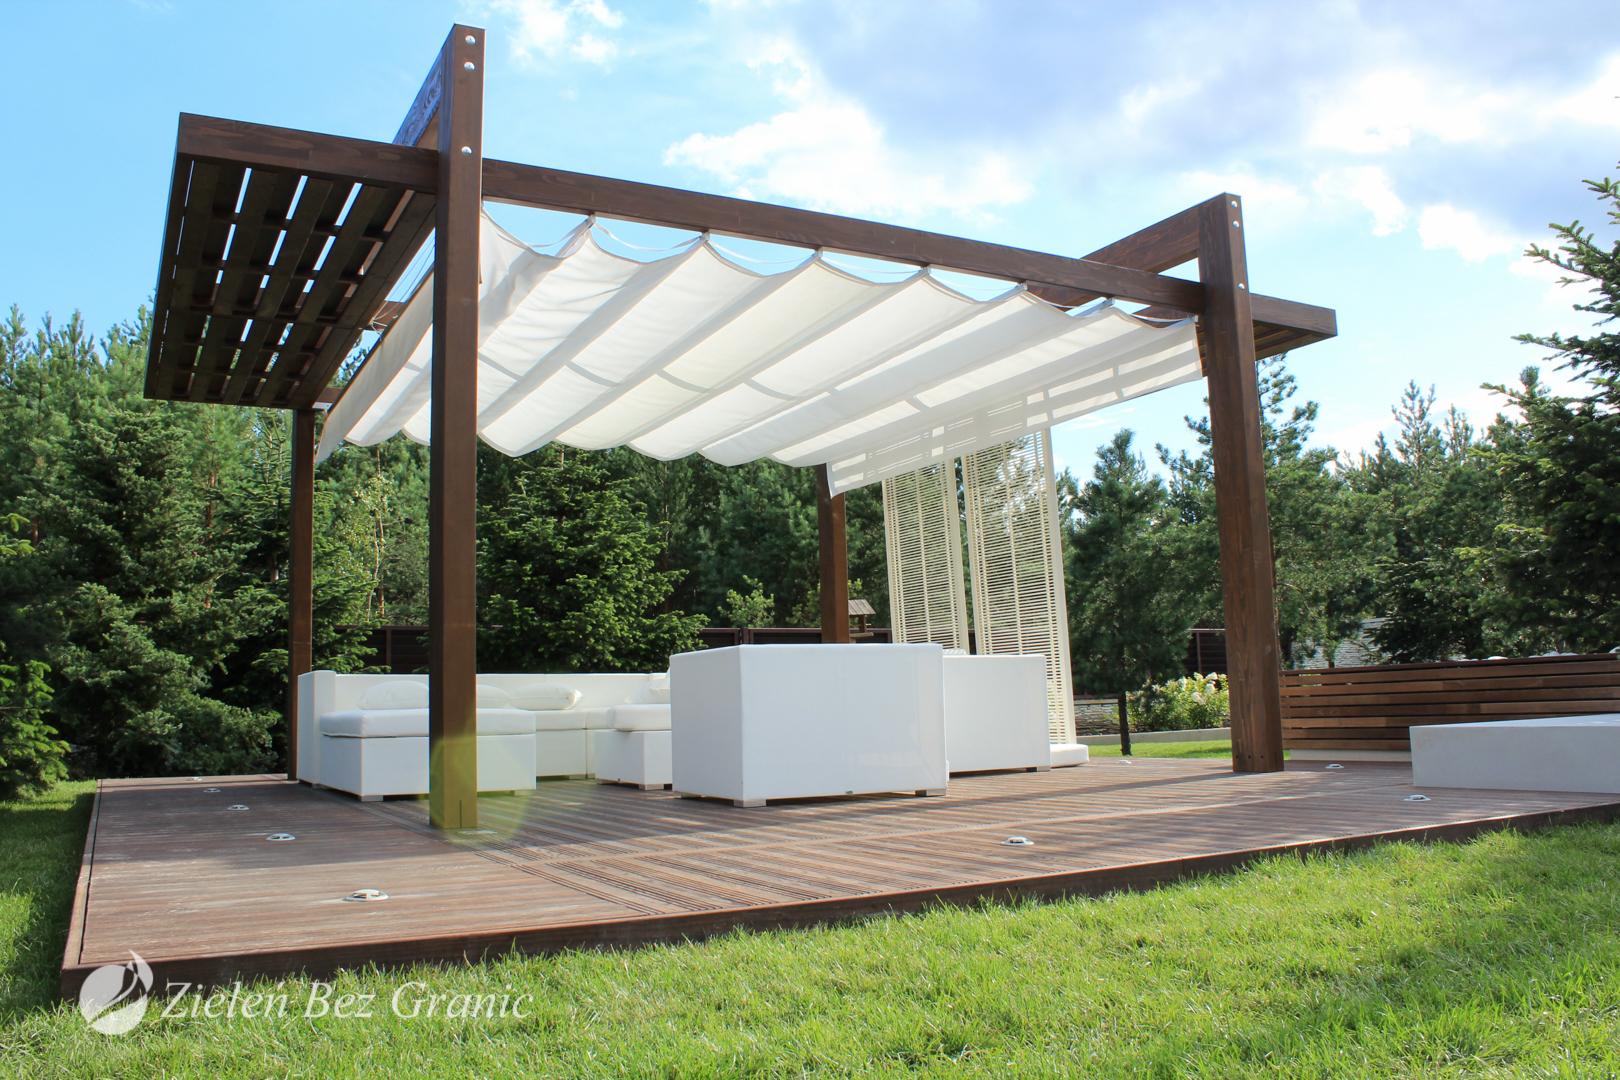 zdj cia z realizacji projektu le nego ogrodu z drewnian pergol. Black Bedroom Furniture Sets. Home Design Ideas